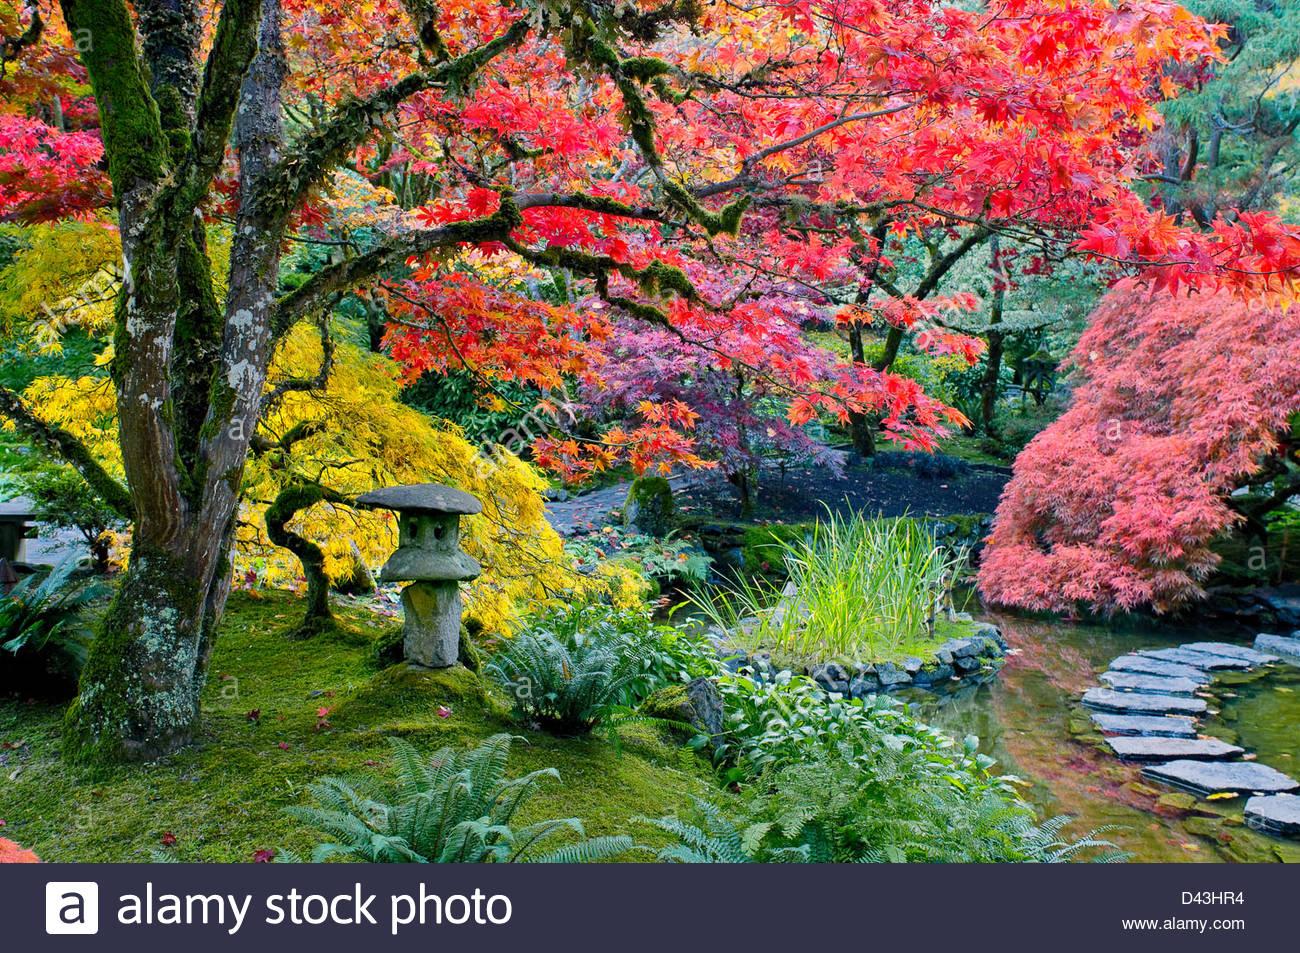 Butchart gardens herbst farbe japanischer garten for Laterne dekorieren herbst